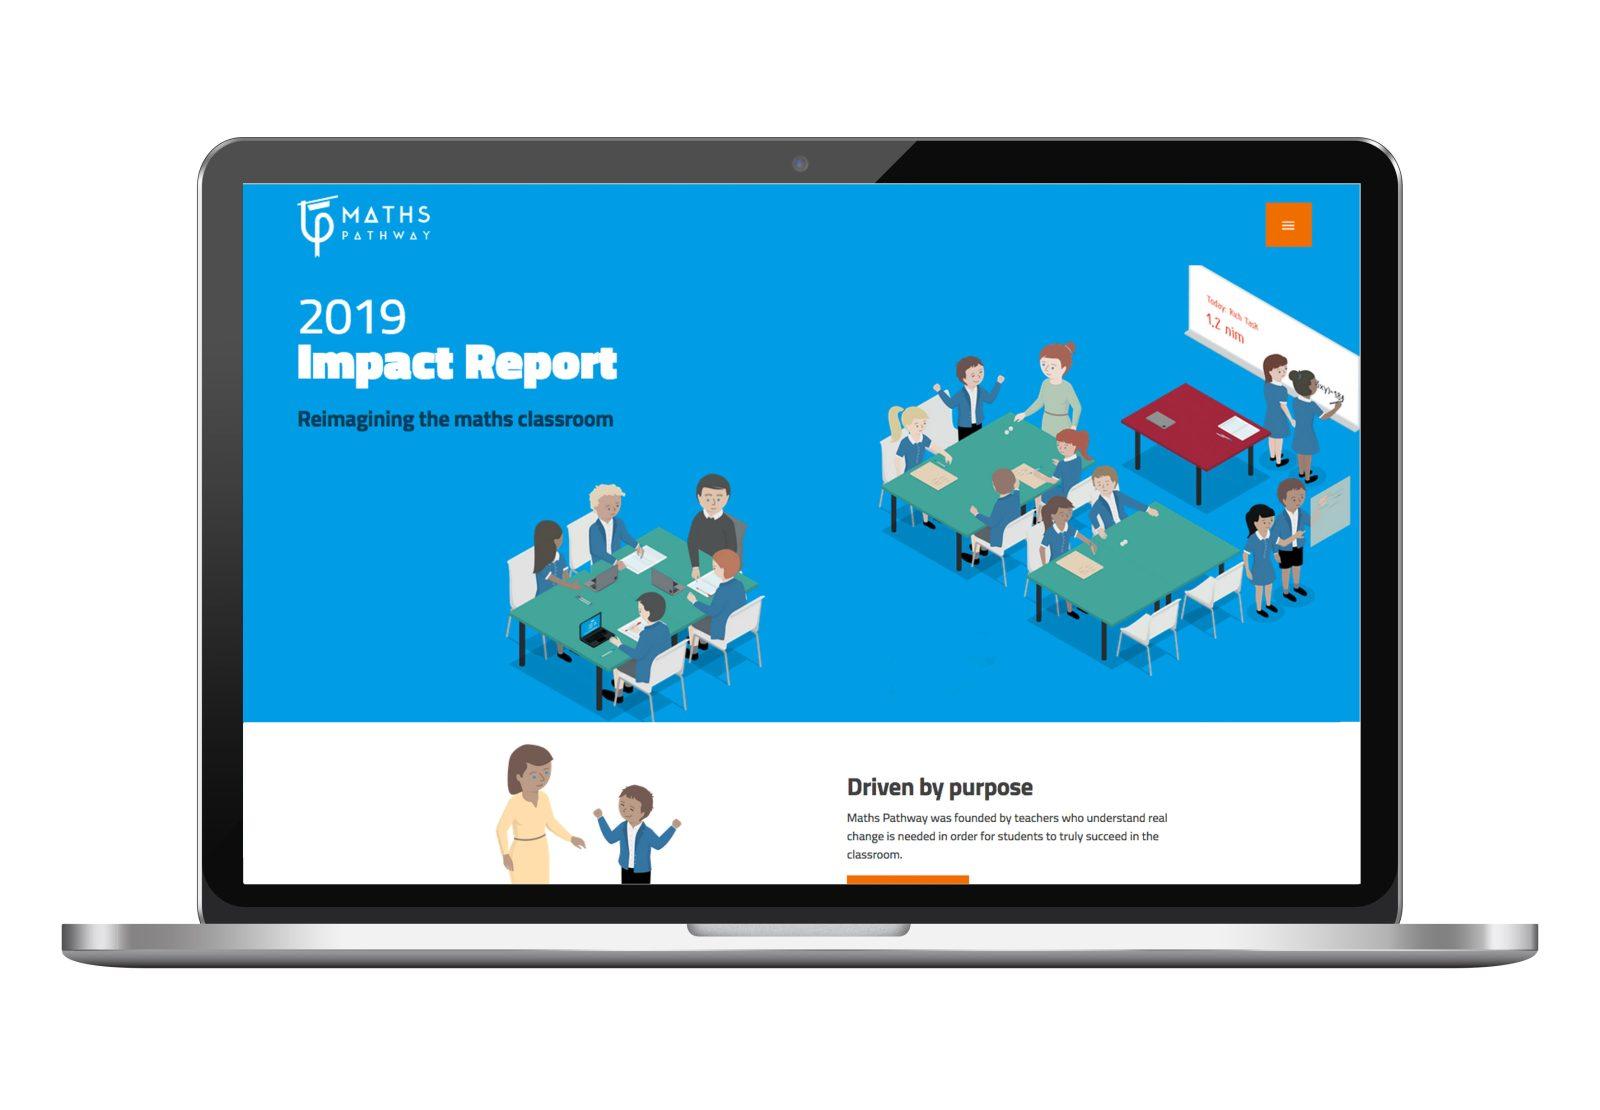 Maths Pathway Impact Report on laptop